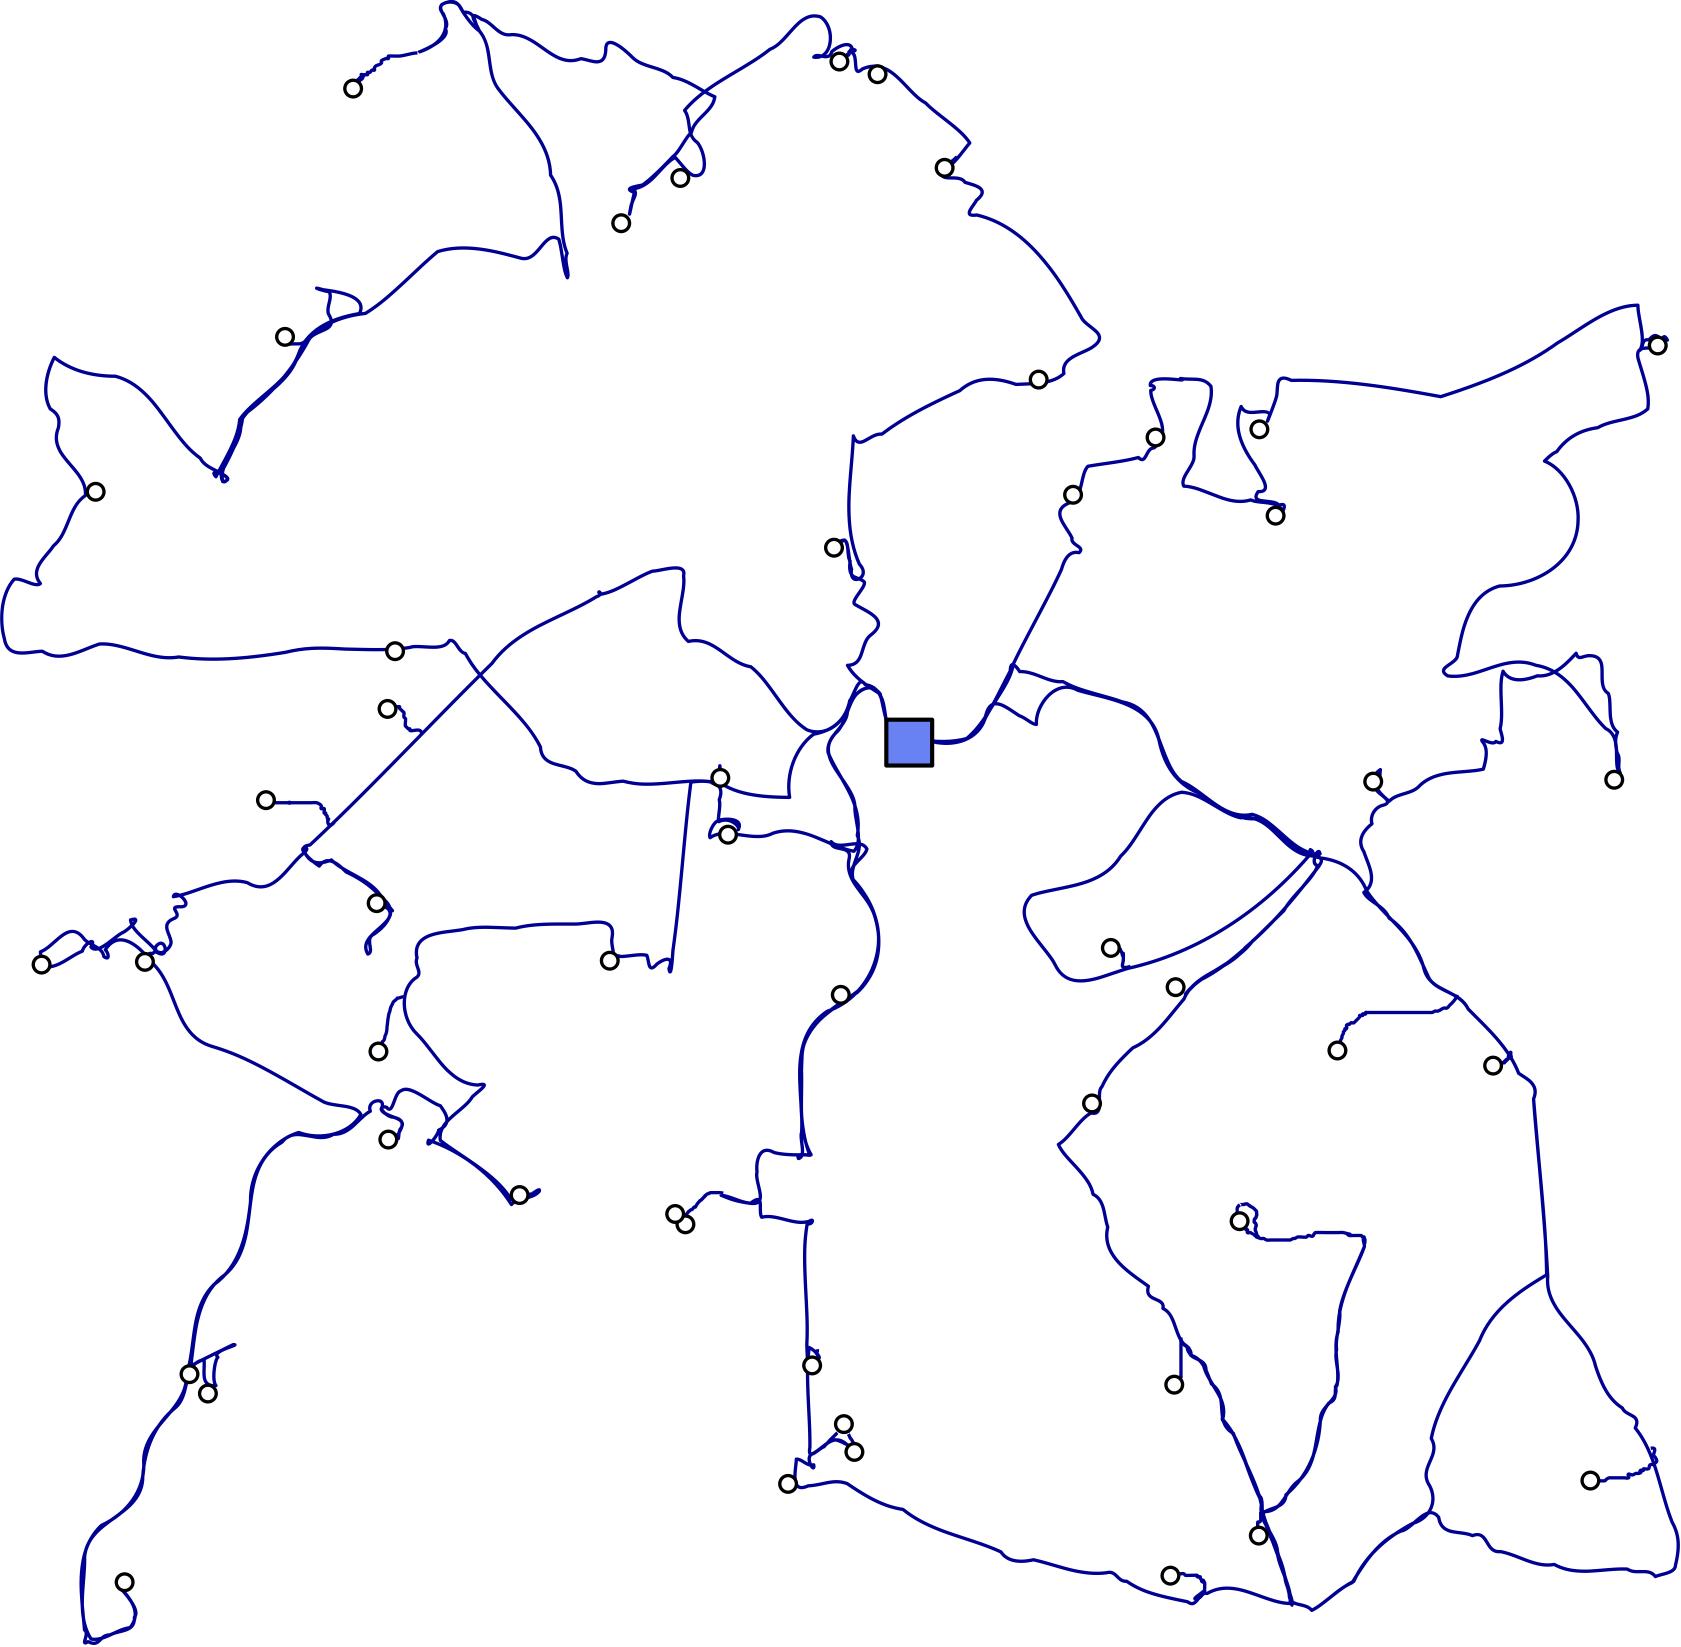 Instances ACVRP - depot